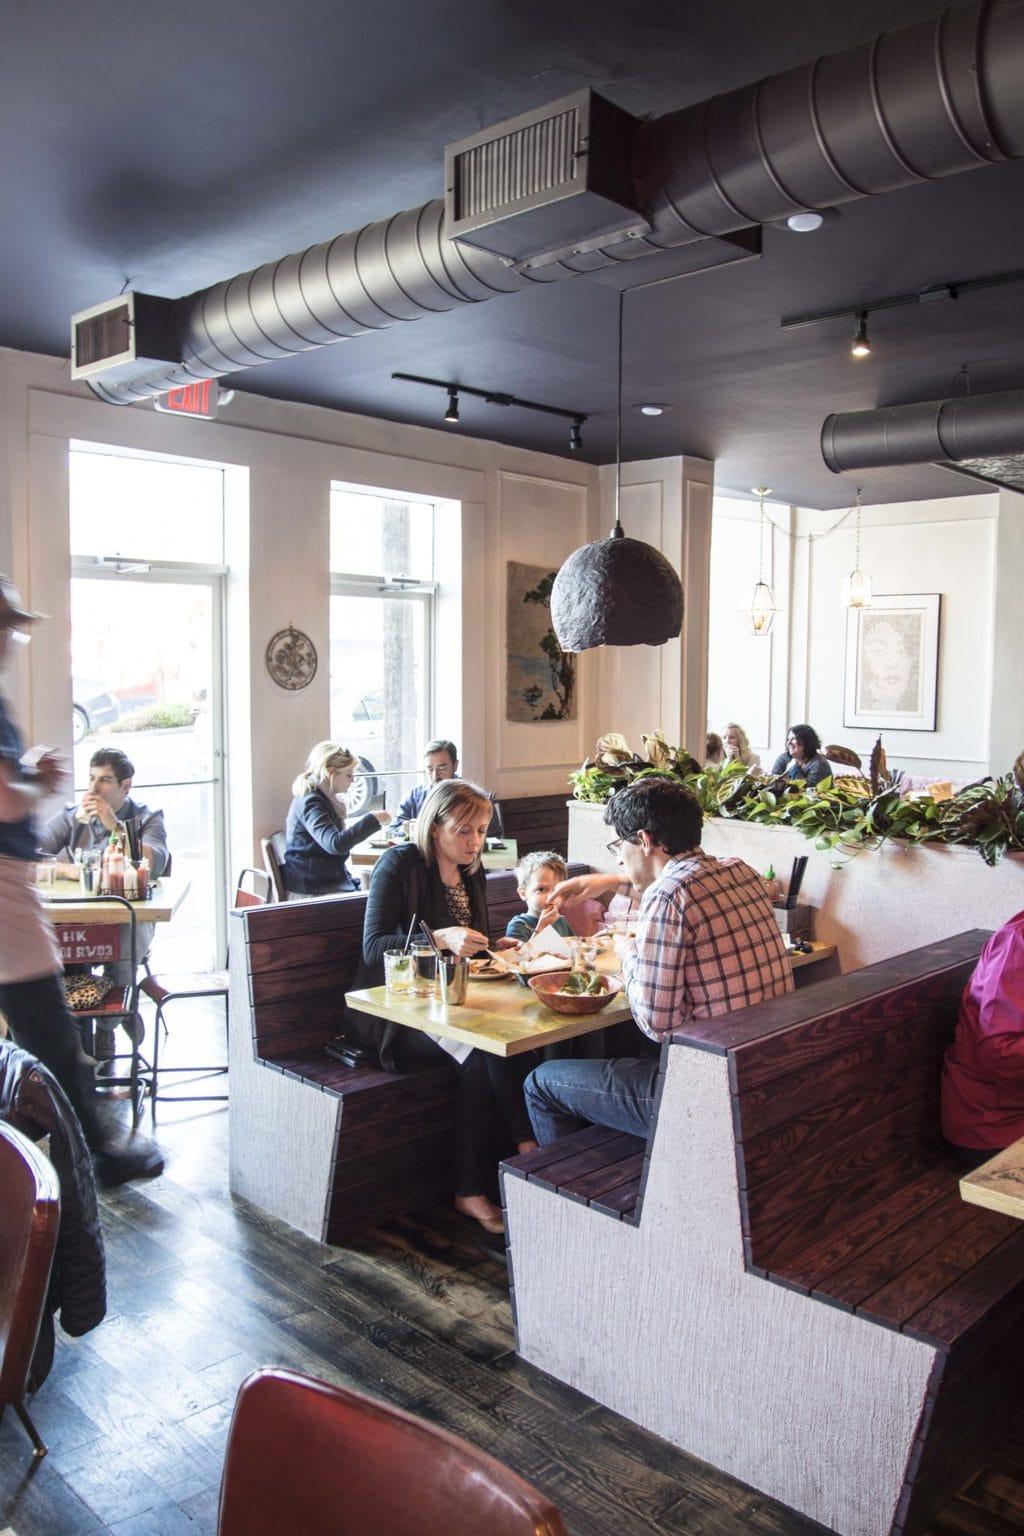 Eclectic restaurant design in Bon Ton in Atlanta on Thou Swell @thouswellblog